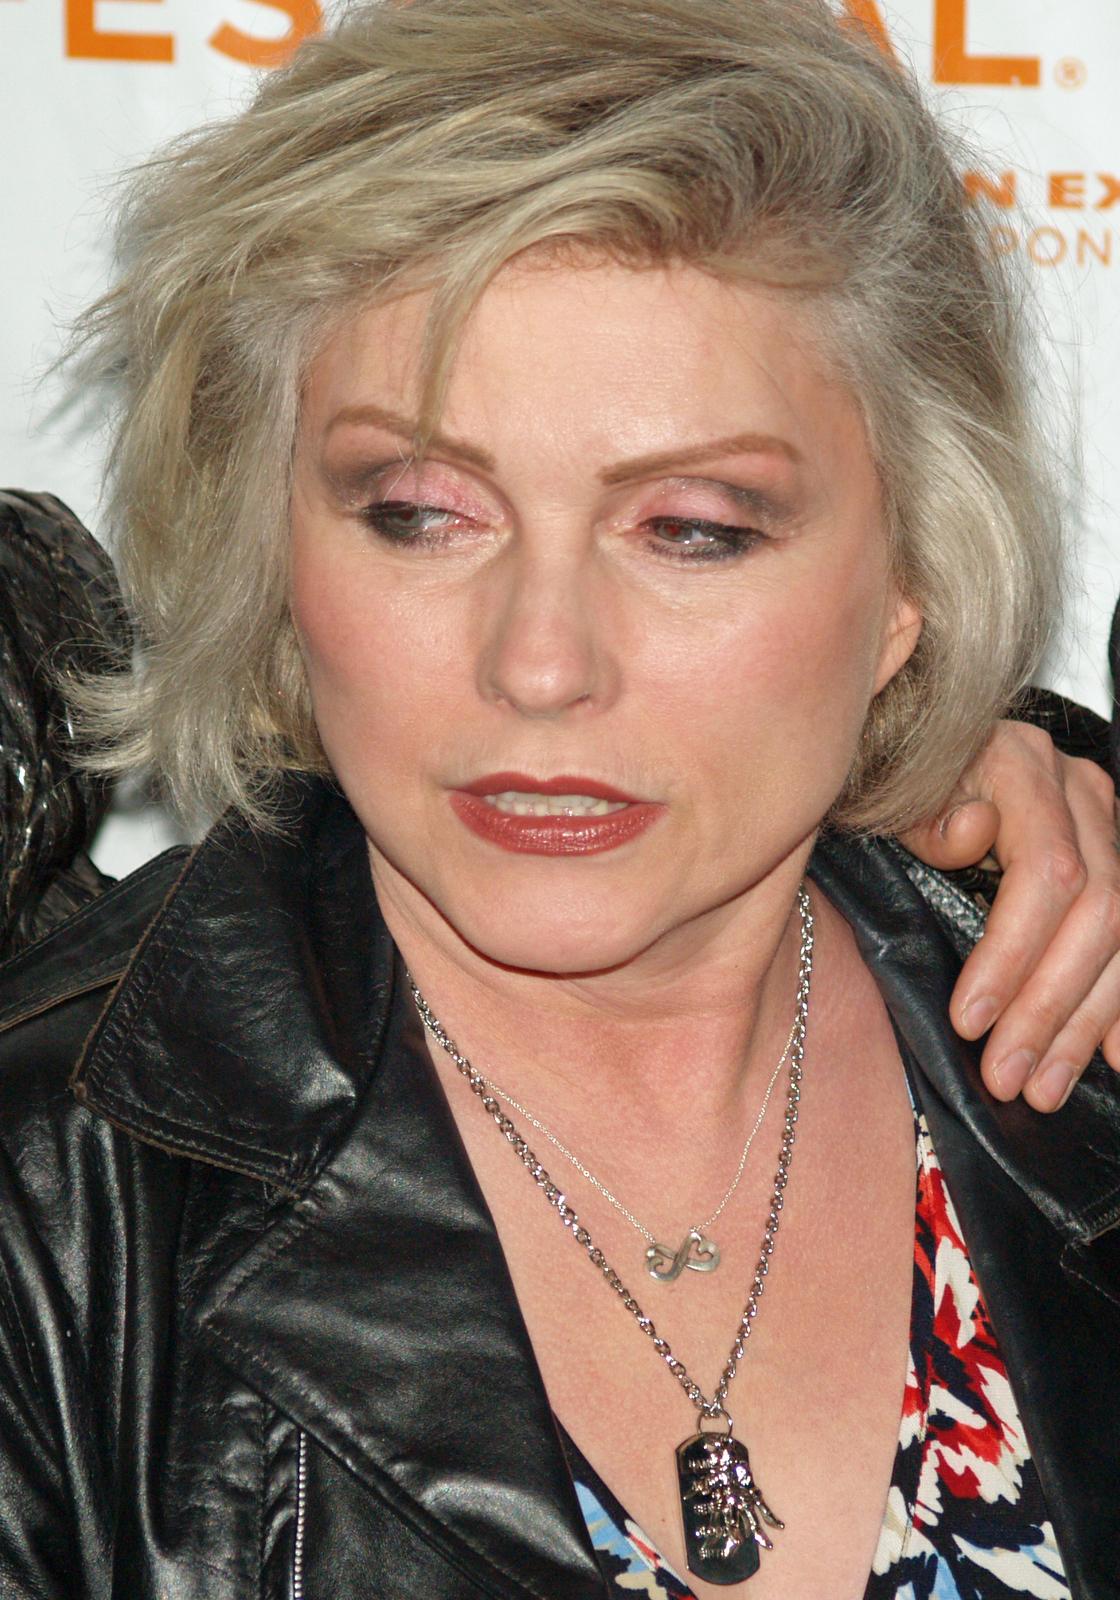 Depiction of Debbie Harry